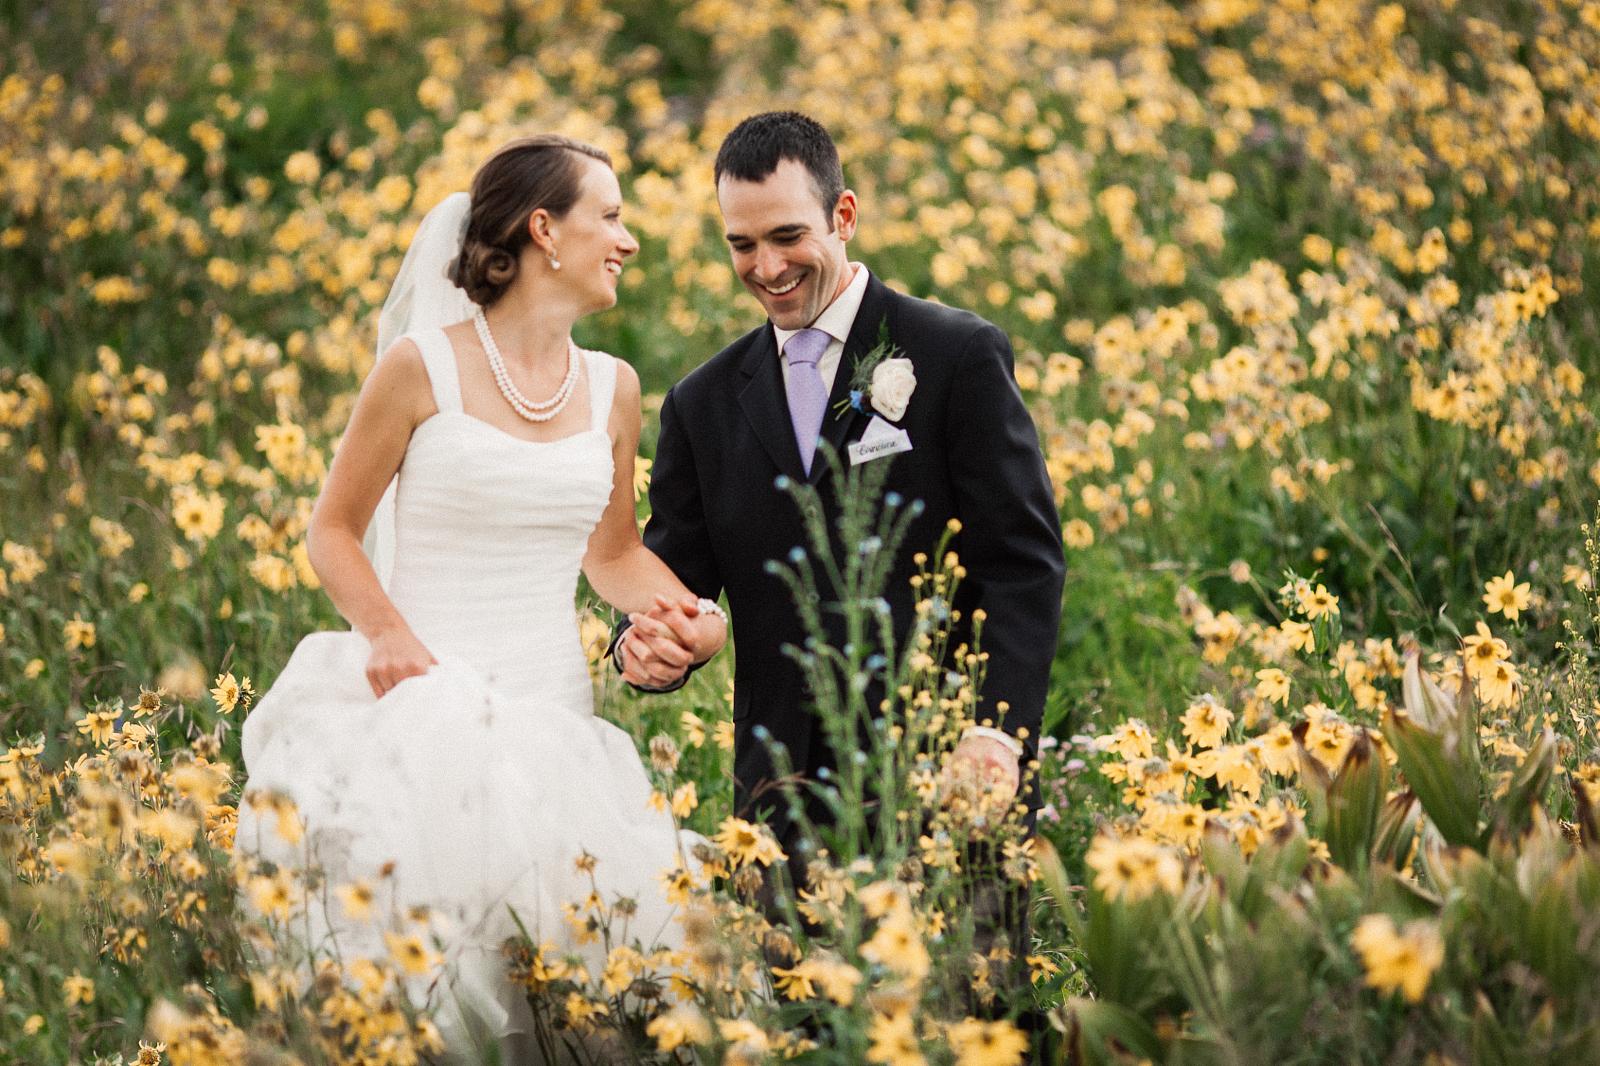 500px blog the passionate photographer community gear for Wedding photographer camera bag